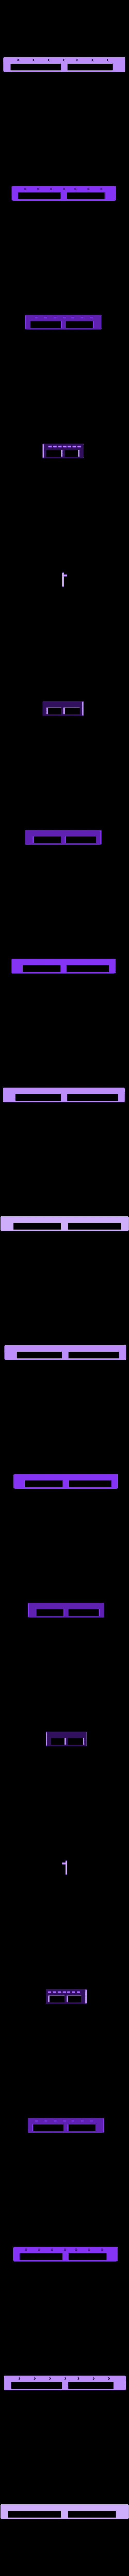 door_beambracket1.stl Download free STL file Cereal box, Loft house • 3D print template, Steedrick